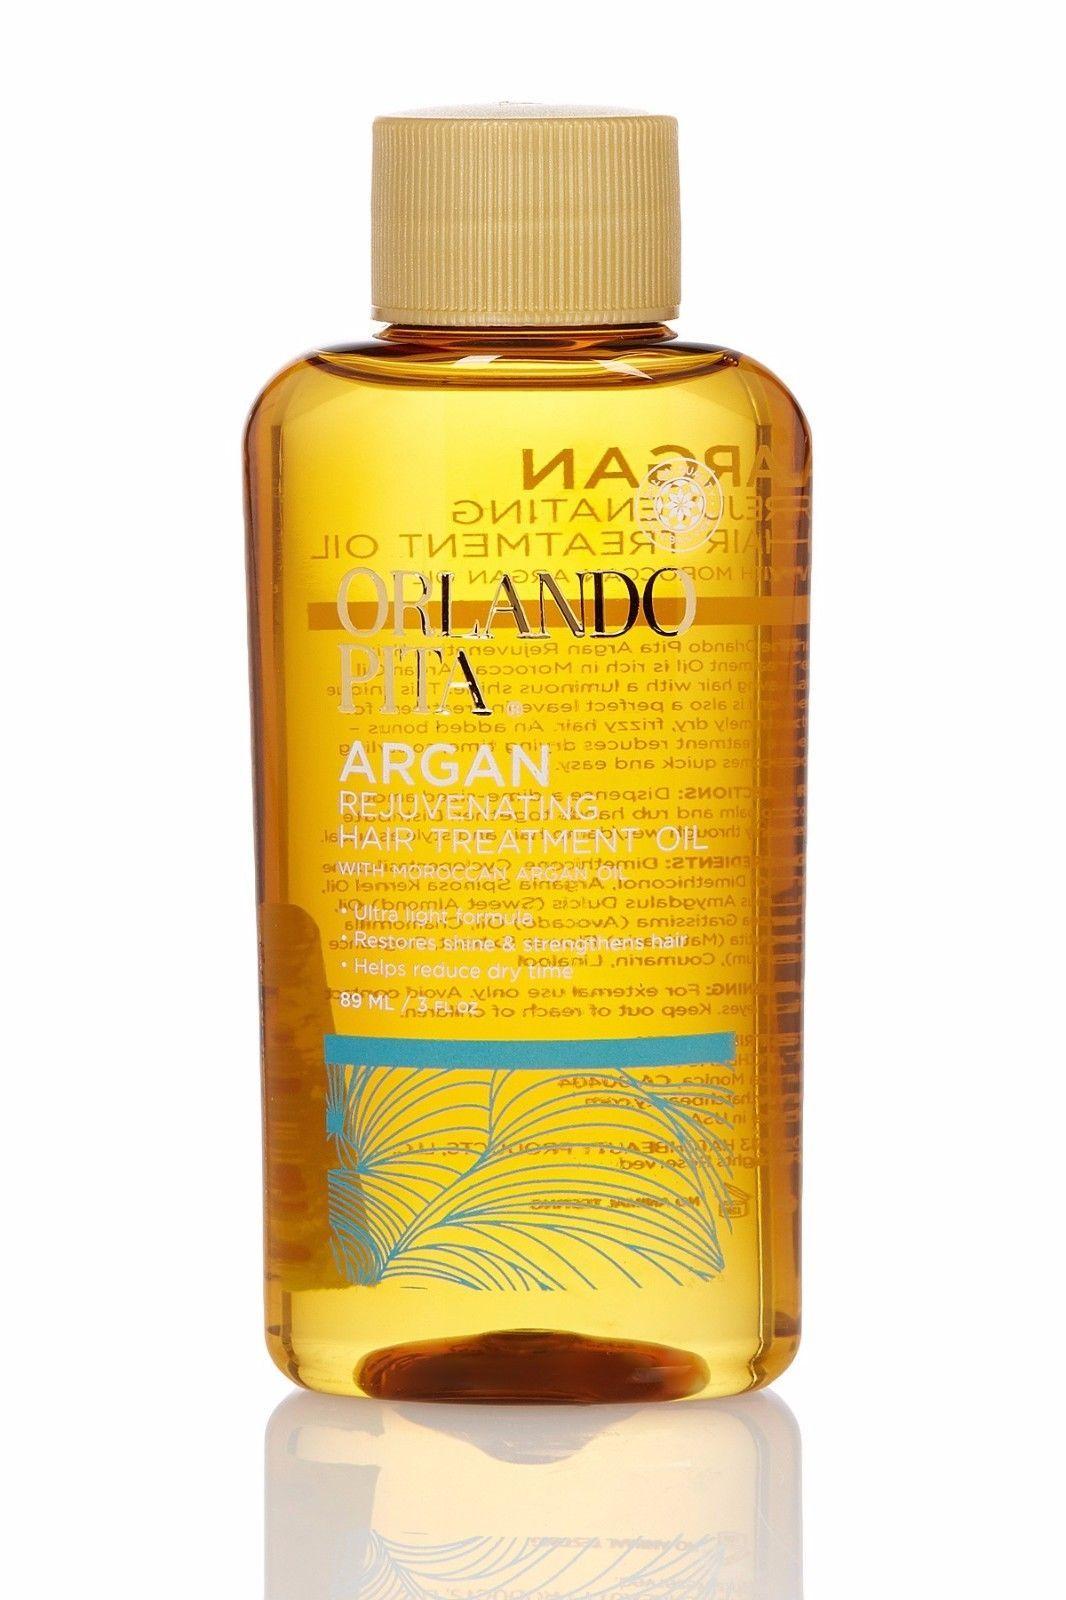 Orlando Pita Argan Rejuvenating Hair Treatment Oil - Moroccan Argan Oil - 3 oz for sale  USA